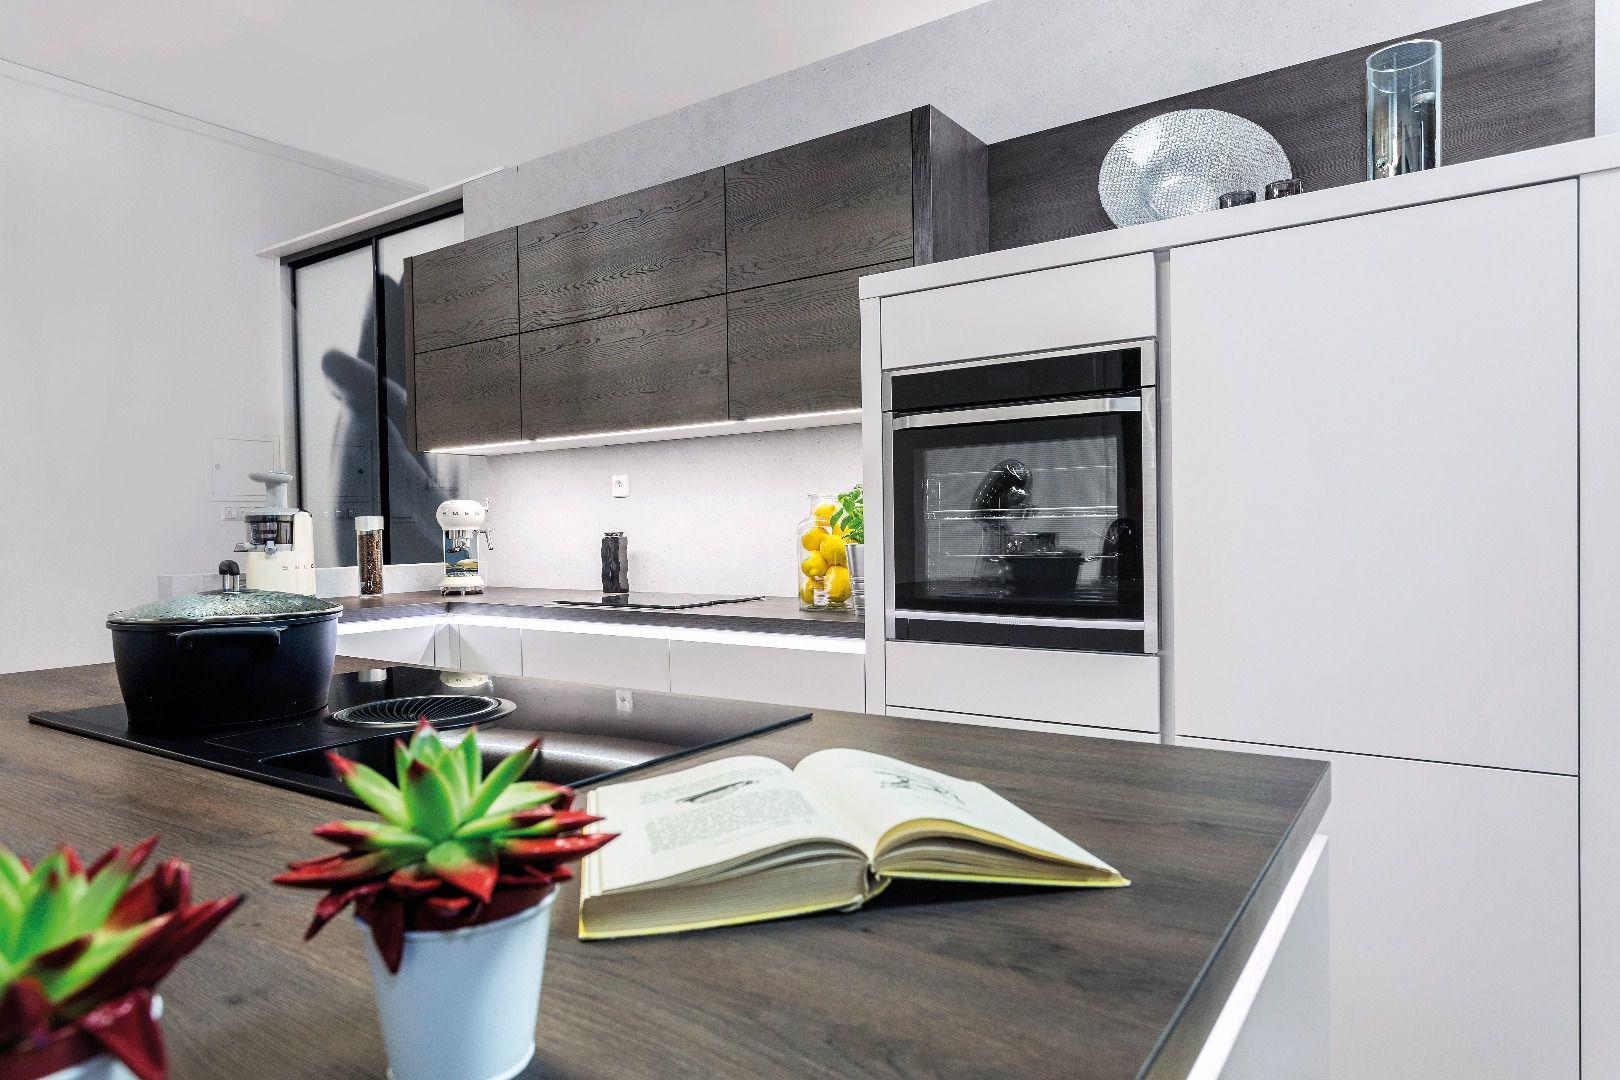 Blat roboczy w kuchni. Fot. Studio Max Kuchnie Starimex